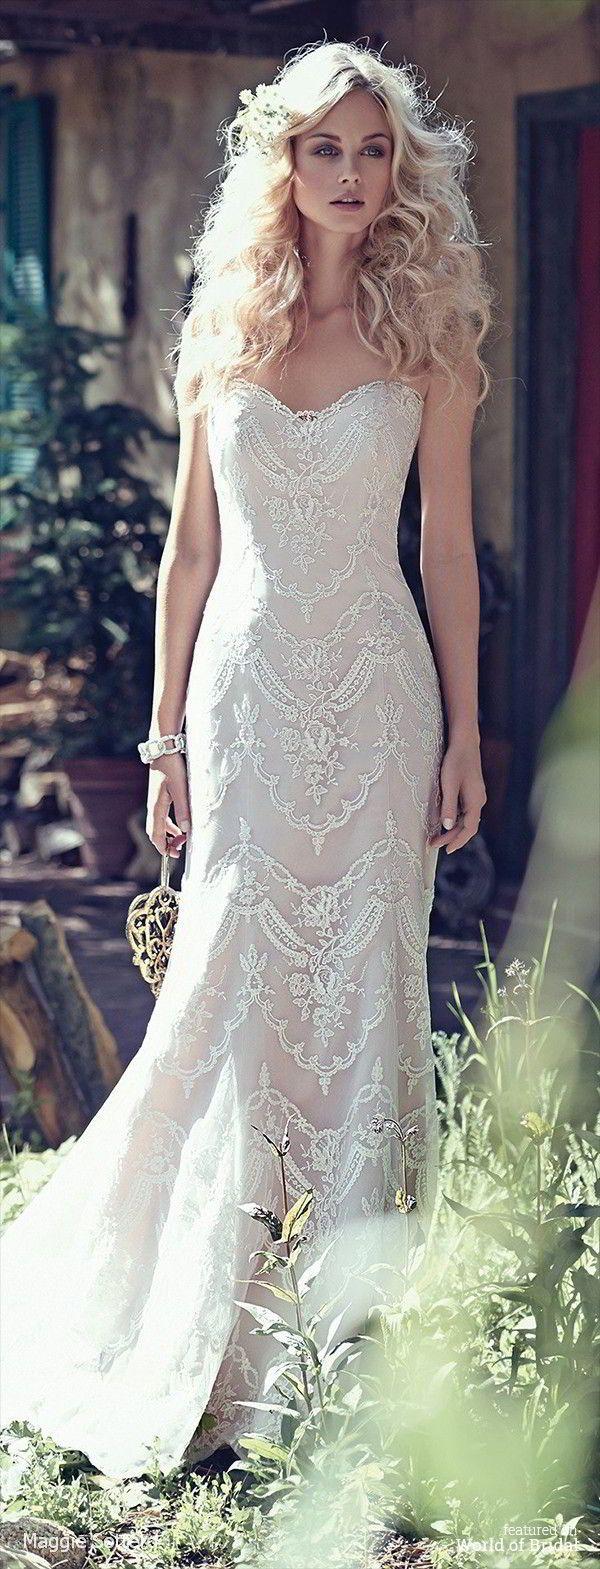 Best 25+ Sheath wedding dresses ideas on Pinterest | Sheath ...